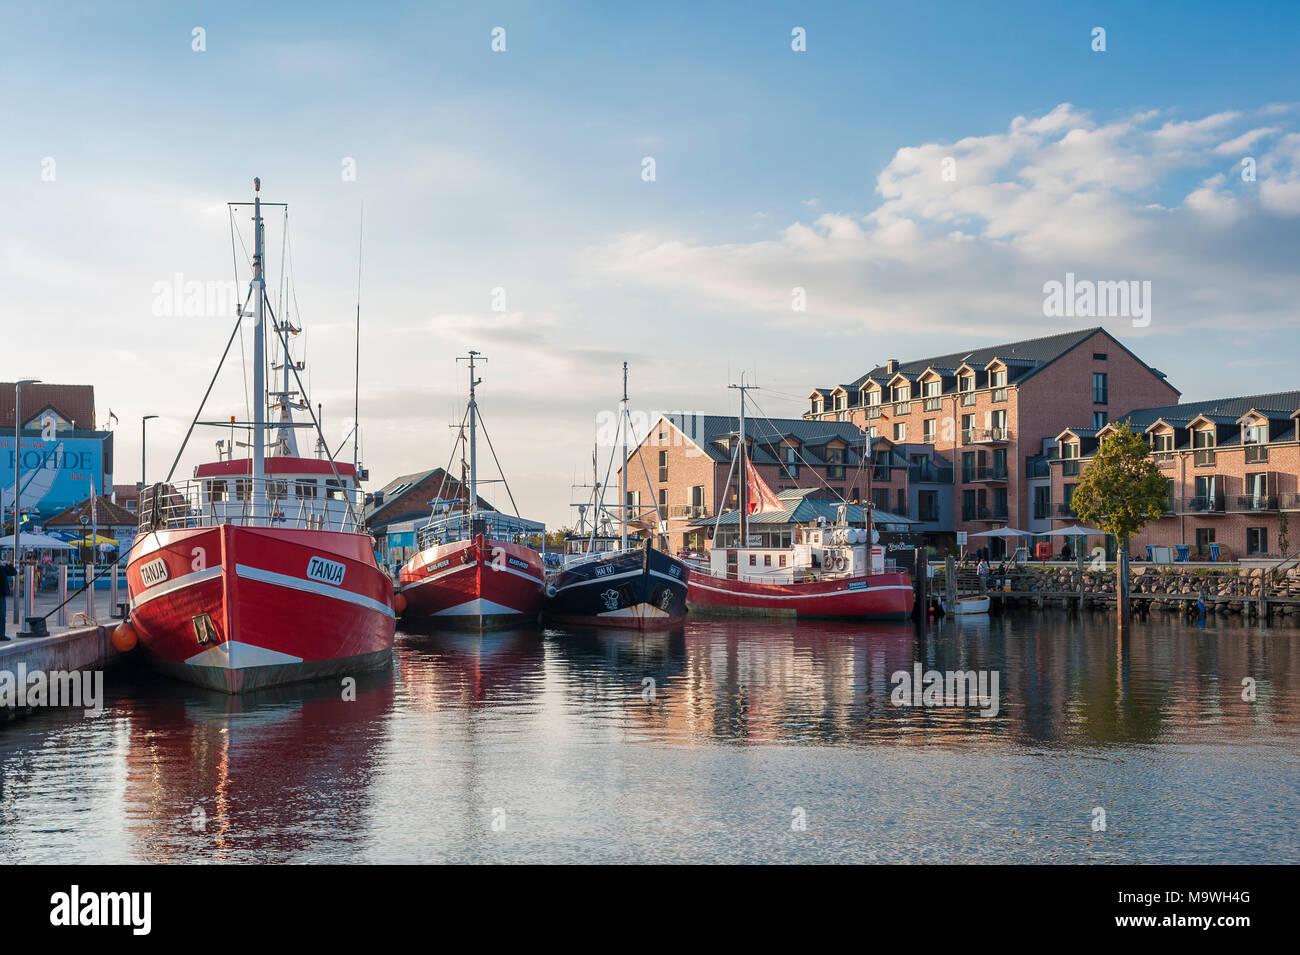 Fishing port, Heiligenhafen, Baltic Sea, Schleswig-Holstein, Germany, Europe - Stock Image